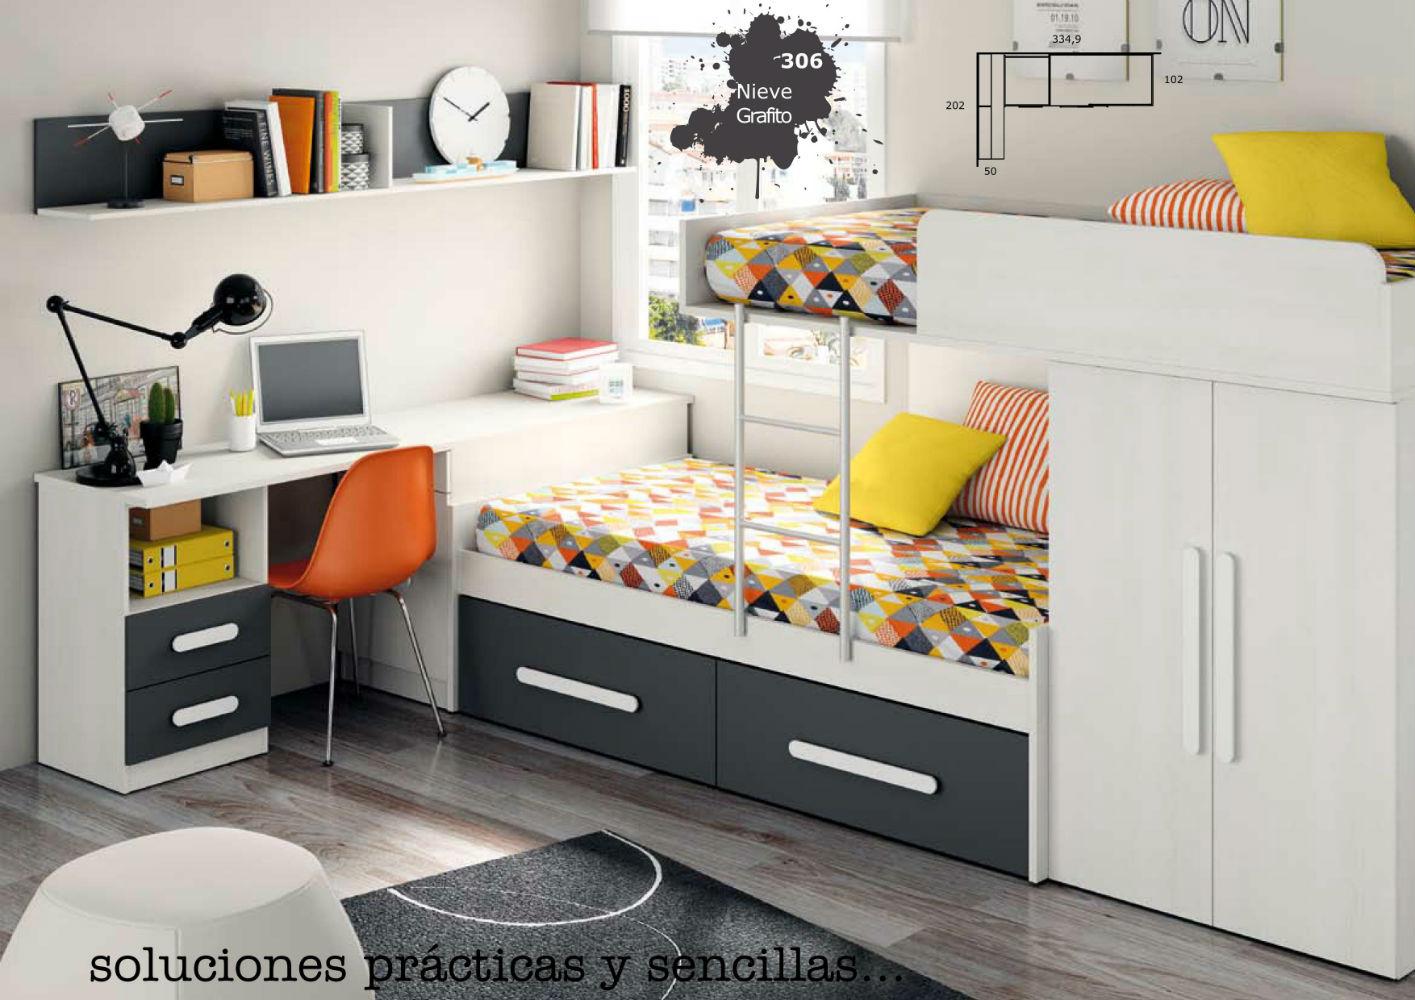 Litera tren mueble dormitorio infantil juvenil completo for Muebles dormitorio infantil juvenil